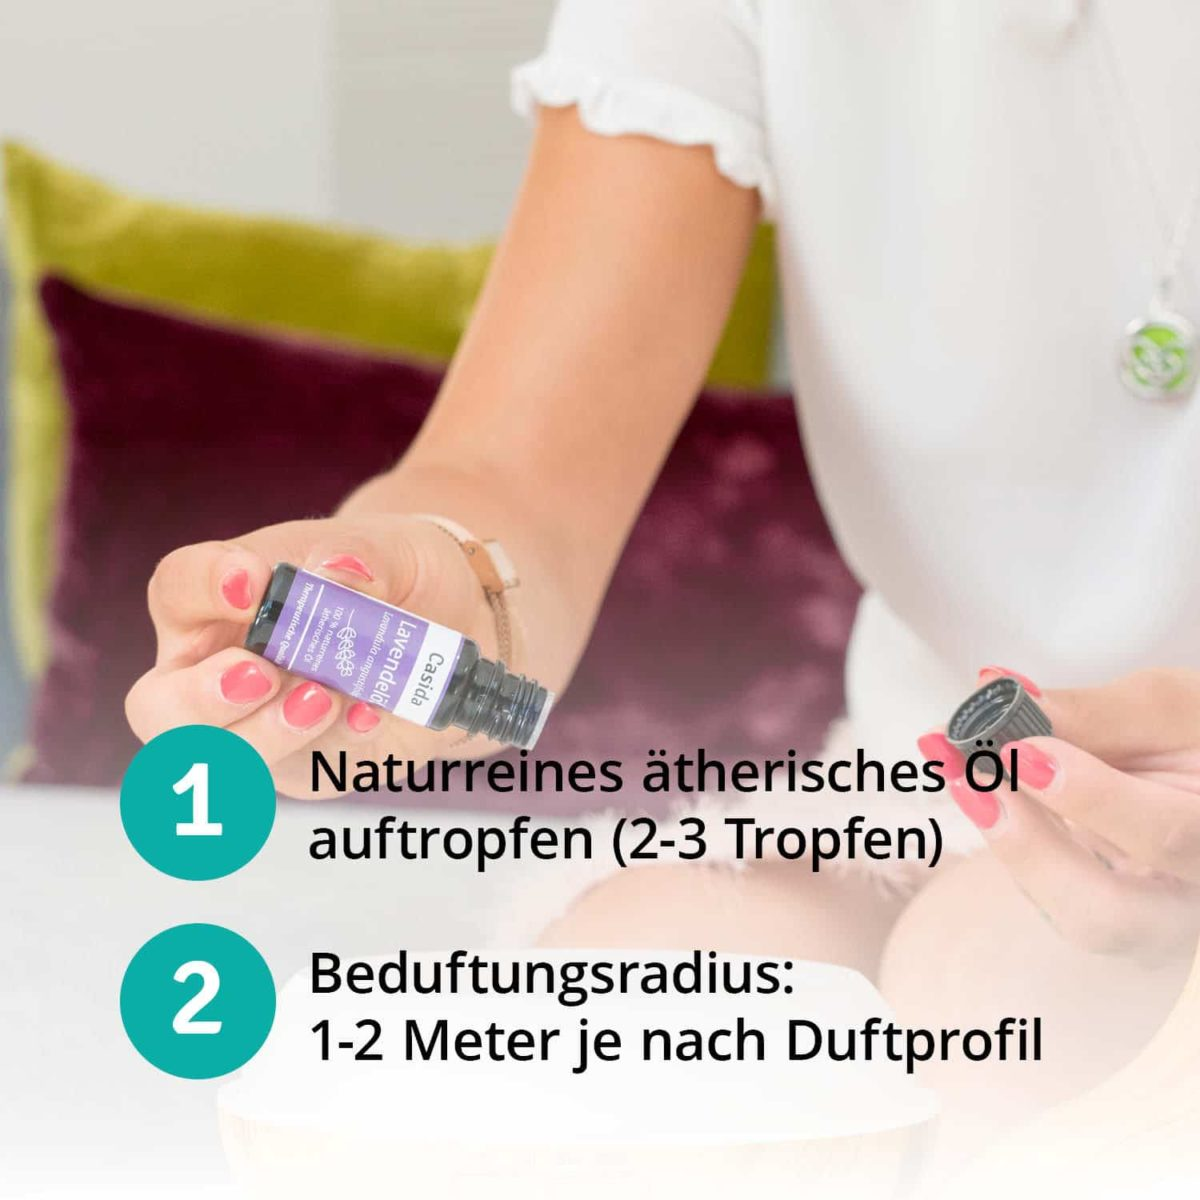 Casida Duftstein aus Keramik 1 Stk. 17439912 PZN Apotheke Aromatherapie Ätherische Öle Diffuser6